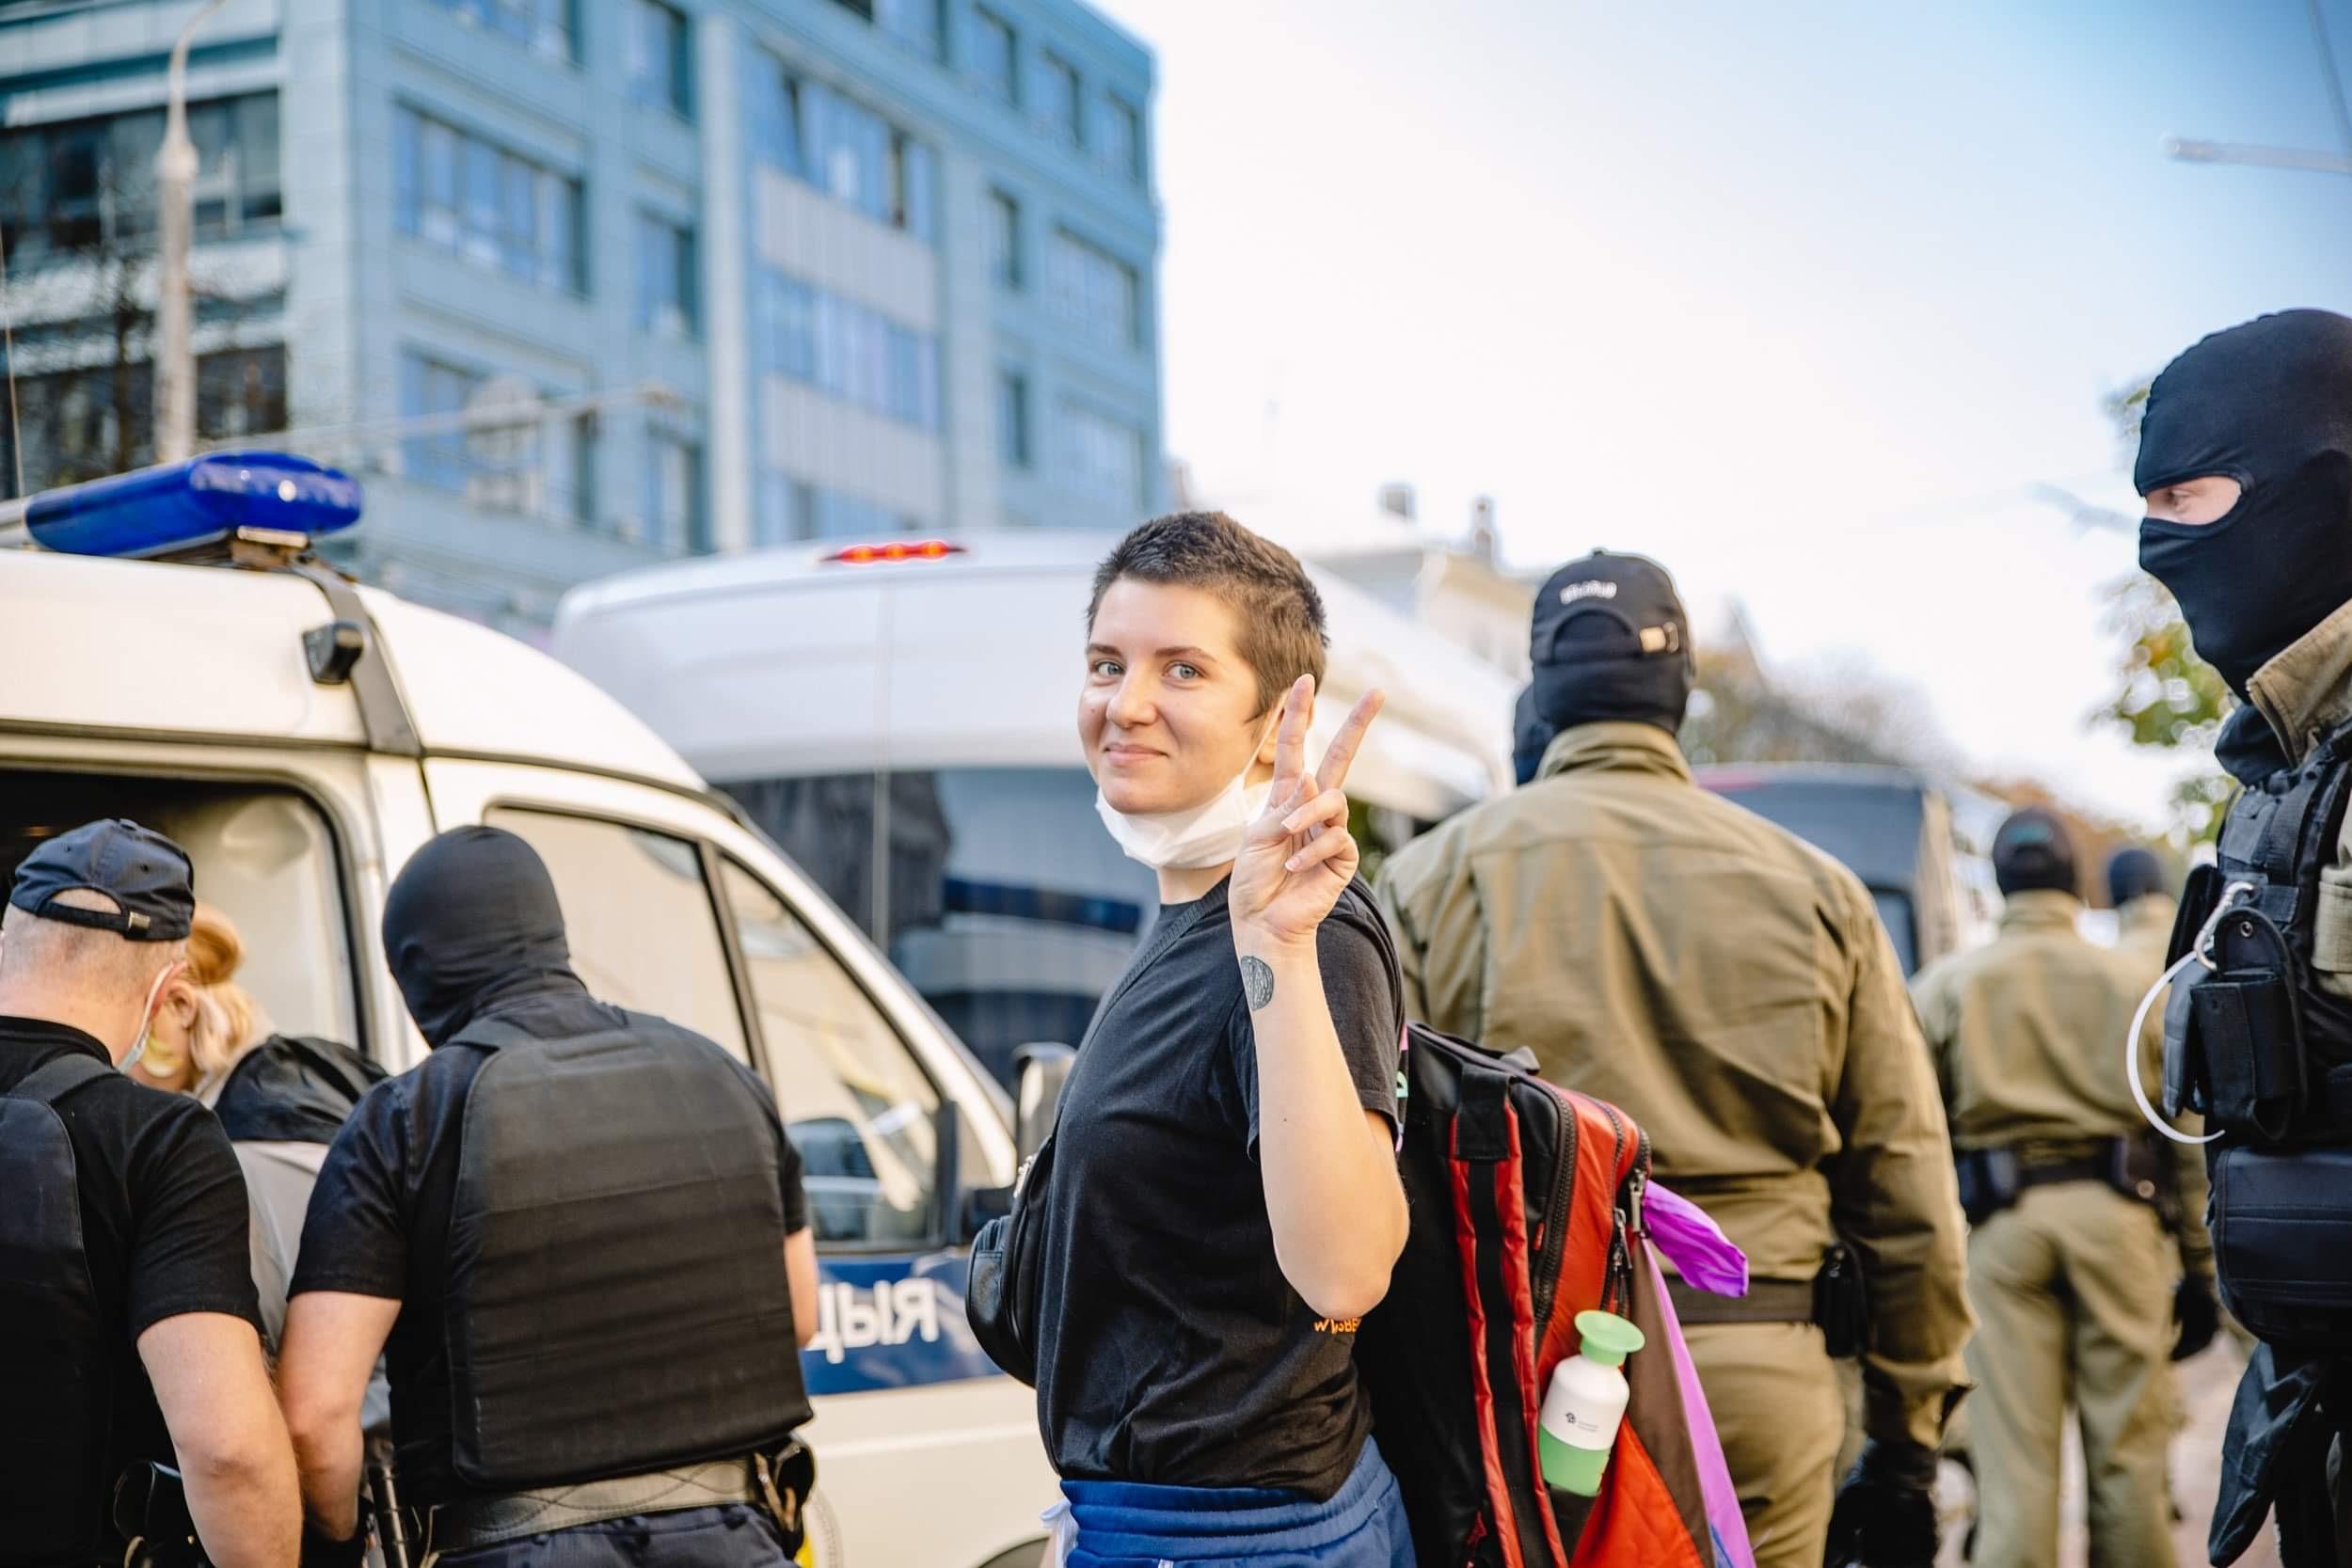 Belarus: Free LGBT+ activist